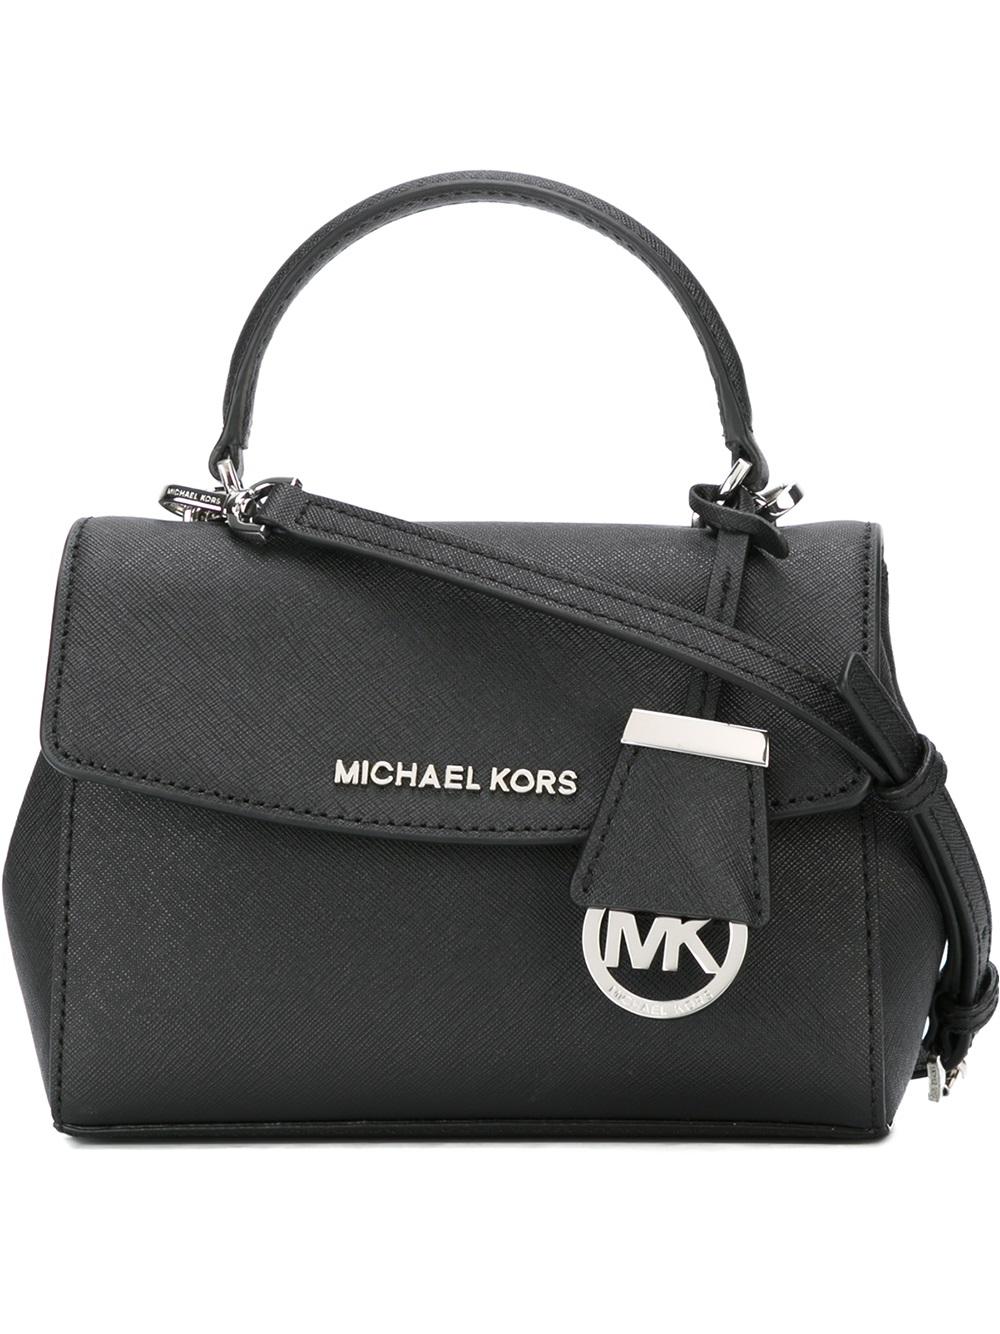 MICHAEL Michael Kors Leather Borsa Crossbody Ava in Black